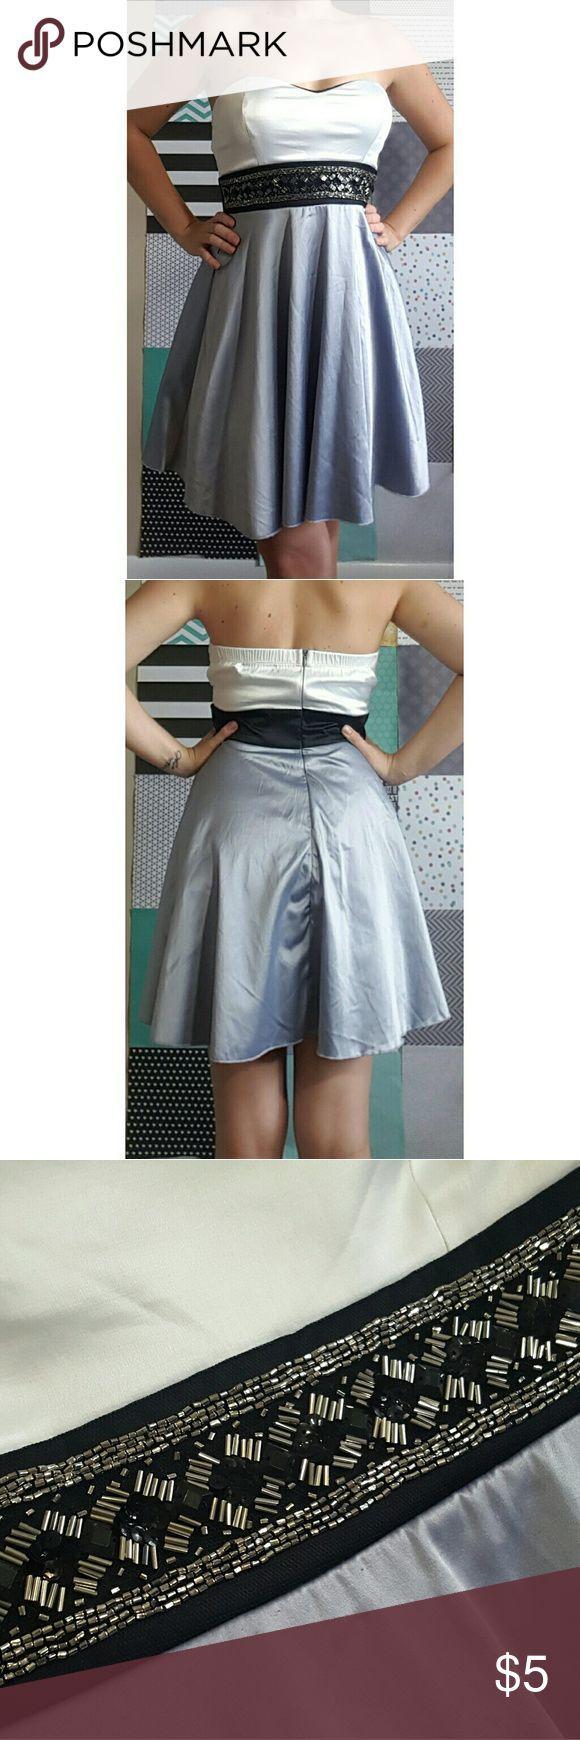 Nice White Dresses For Plus Size SALE Trixxi Sweetheart Strapless Knee Length Dress Trixxi, gray/white/black, bea... Check more at http://24store.tk/fashion/white-dresses-for-plus-size-sale-trixxi-sweetheart-strapless-knee-length-dress-trixxi-graywhiteblack-bea/